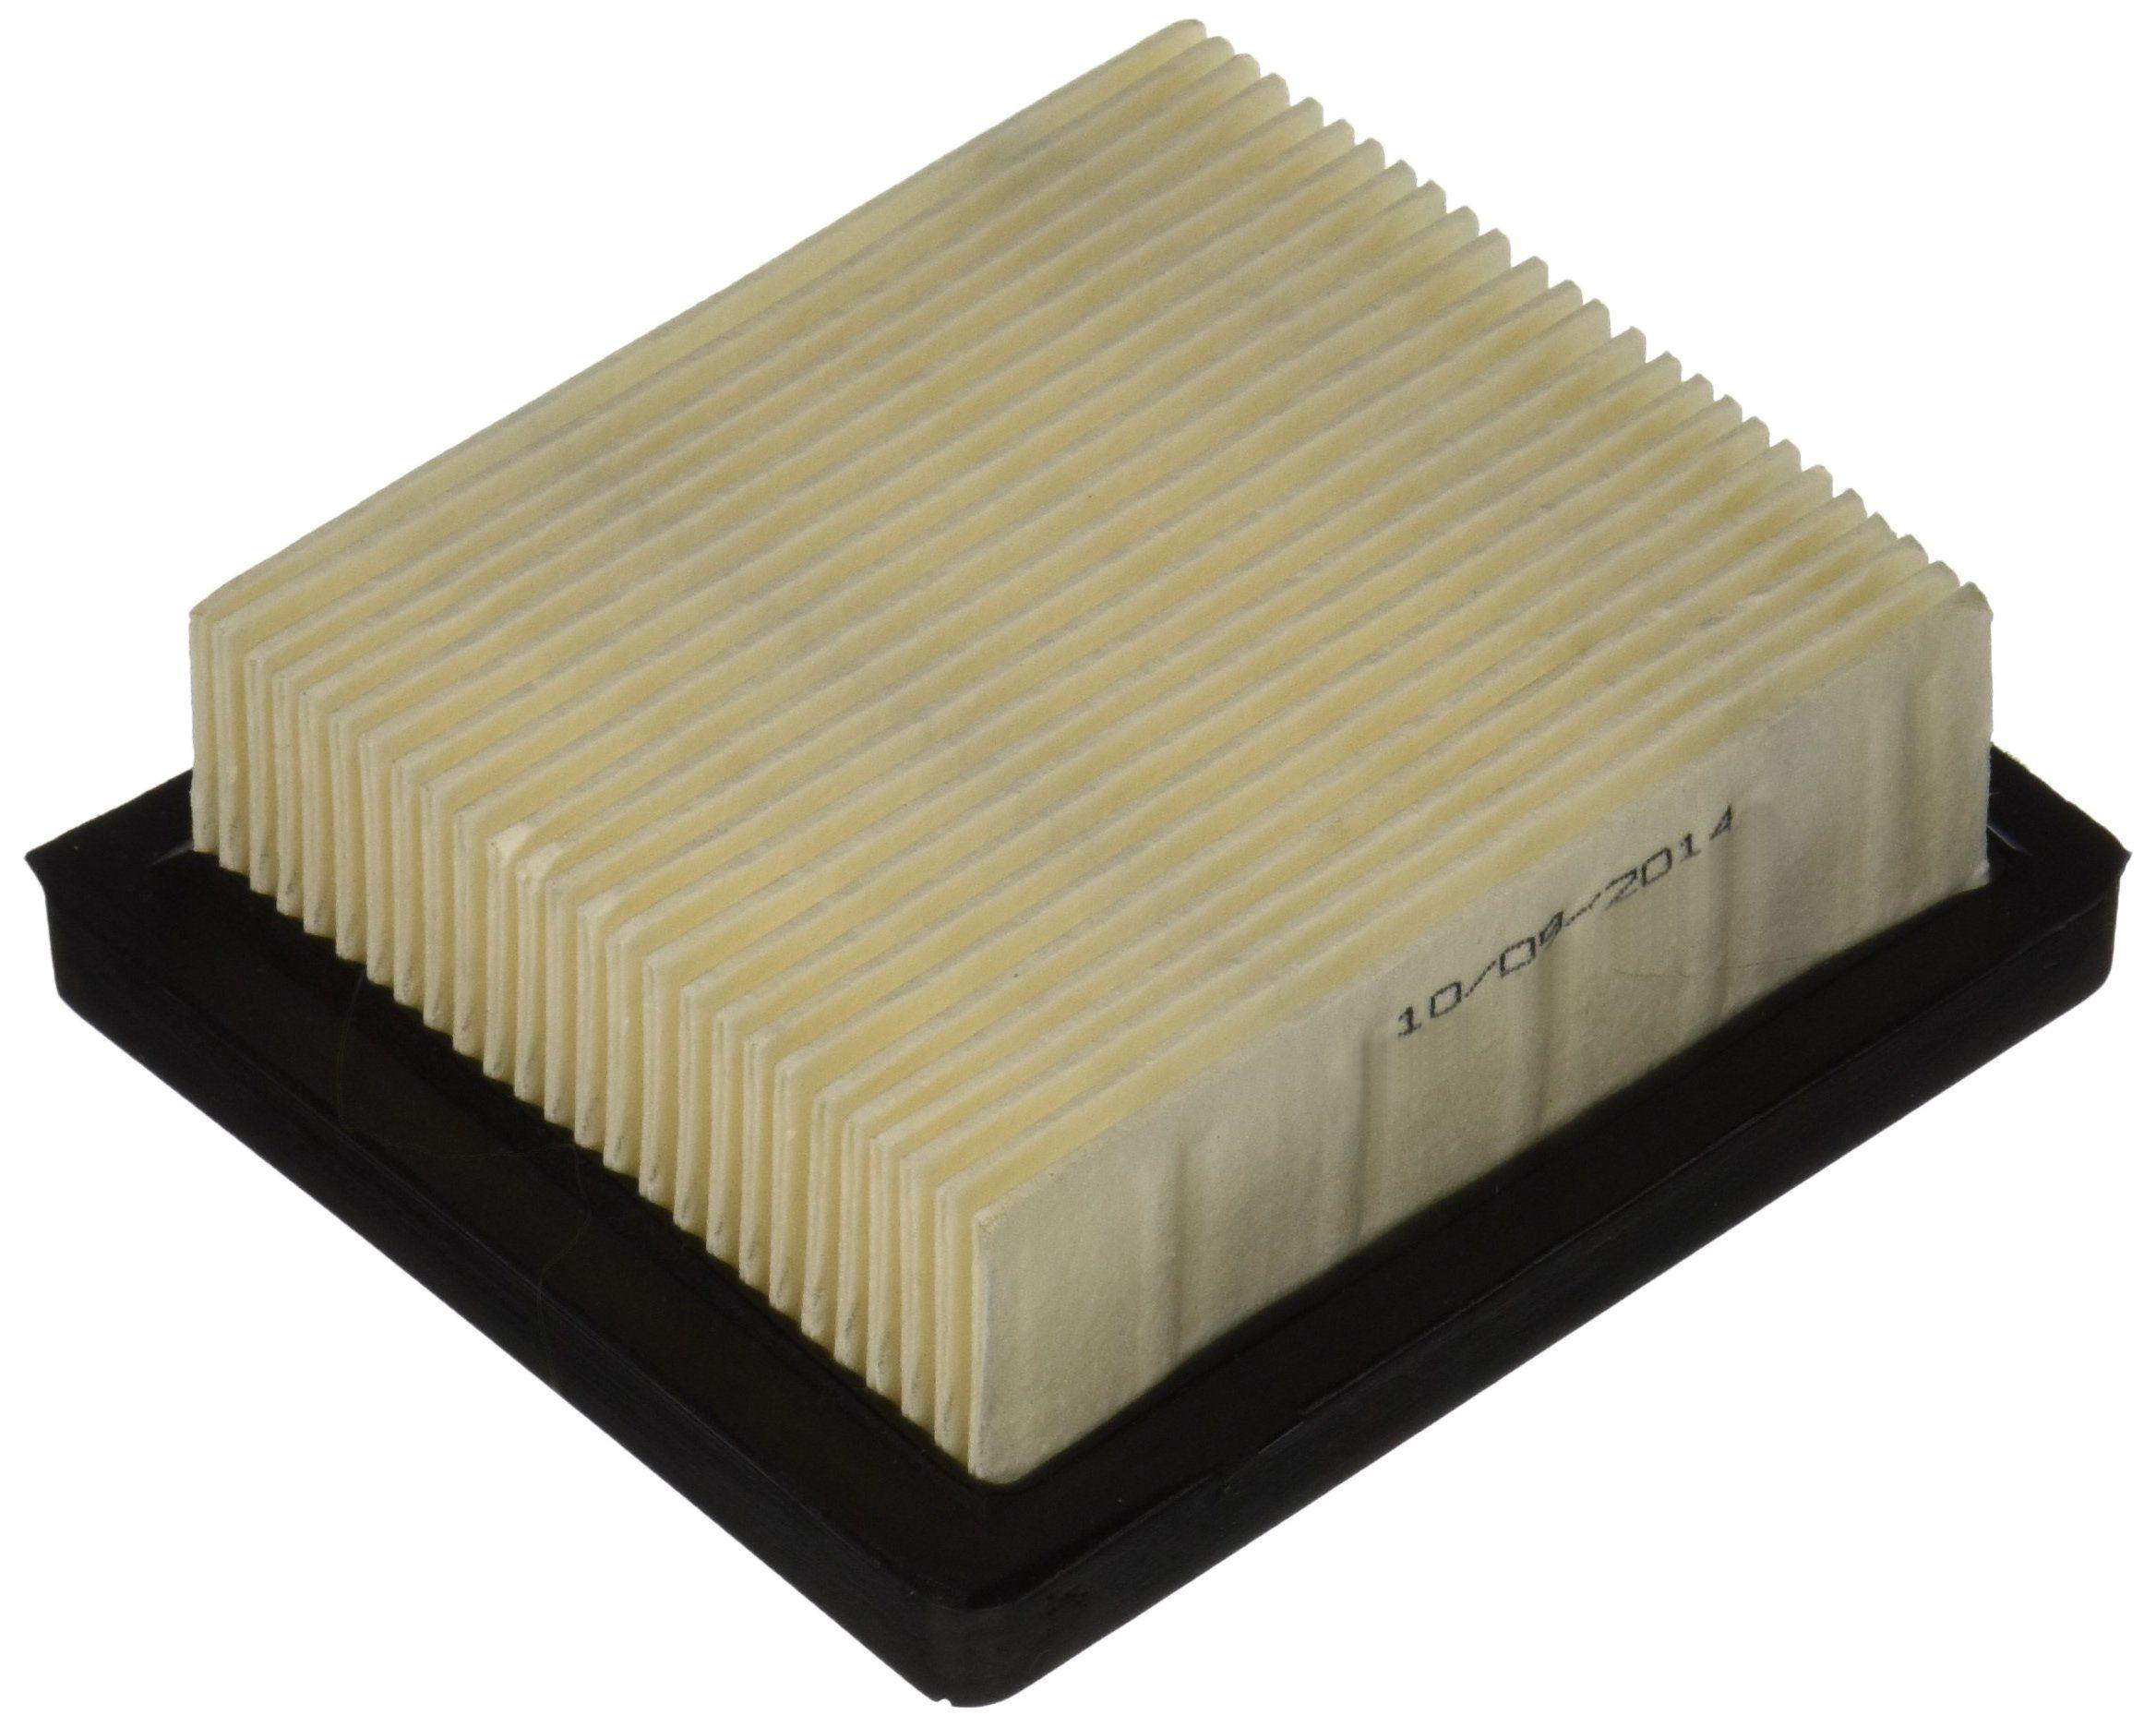 Stens 100450 Air Filter Replaces Tecumseh 36046 740061